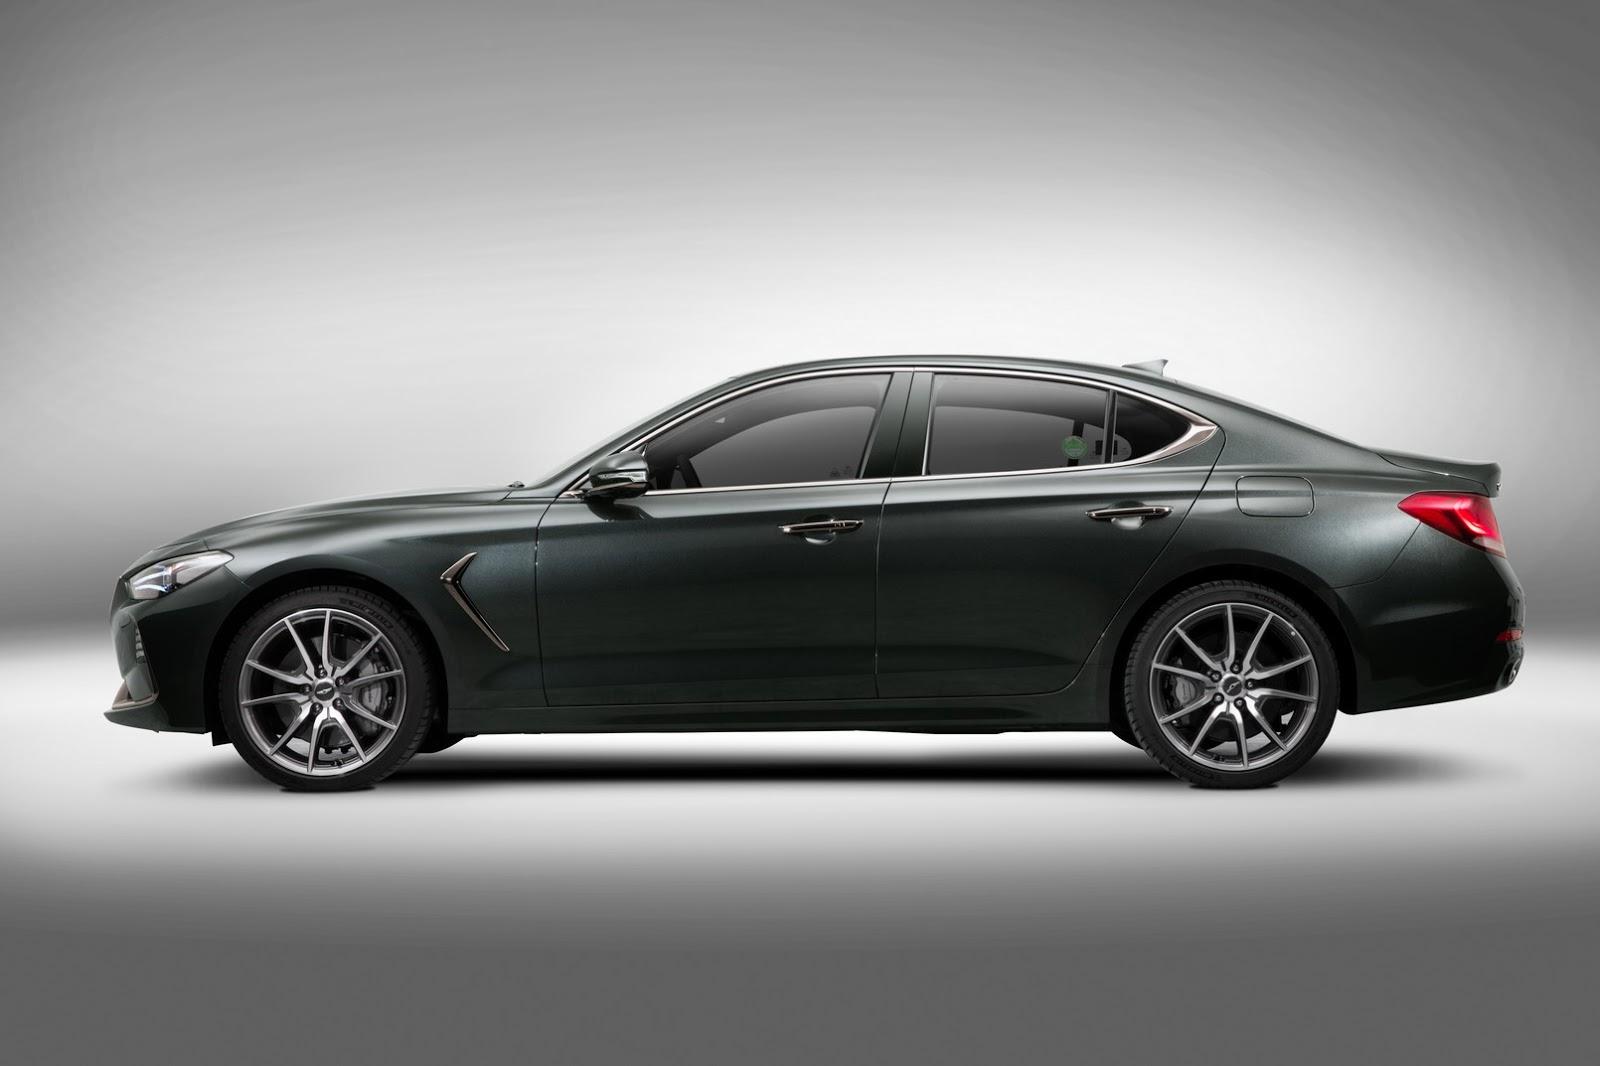 2018 Genesis G70 Sports Sedan Goes Official Looks Fairly